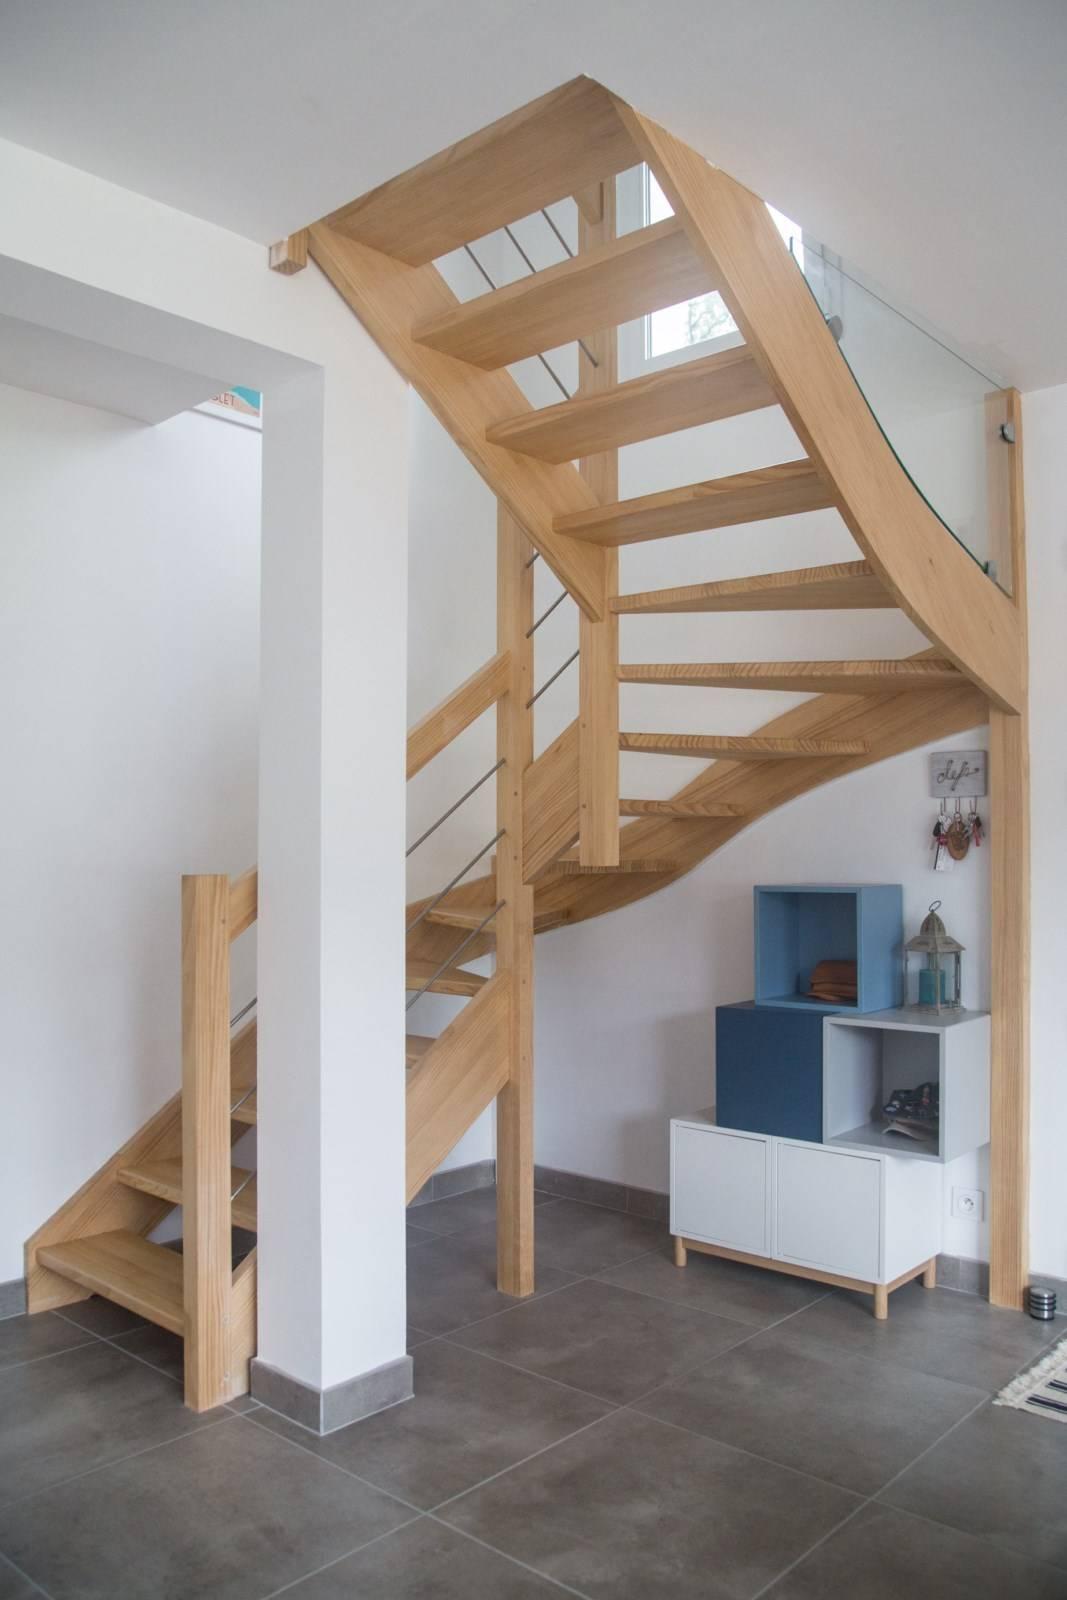 fabriquer un escalier bois rambarde m tal inox bayonne conception d 39 escaliers sur mesure. Black Bedroom Furniture Sets. Home Design Ideas